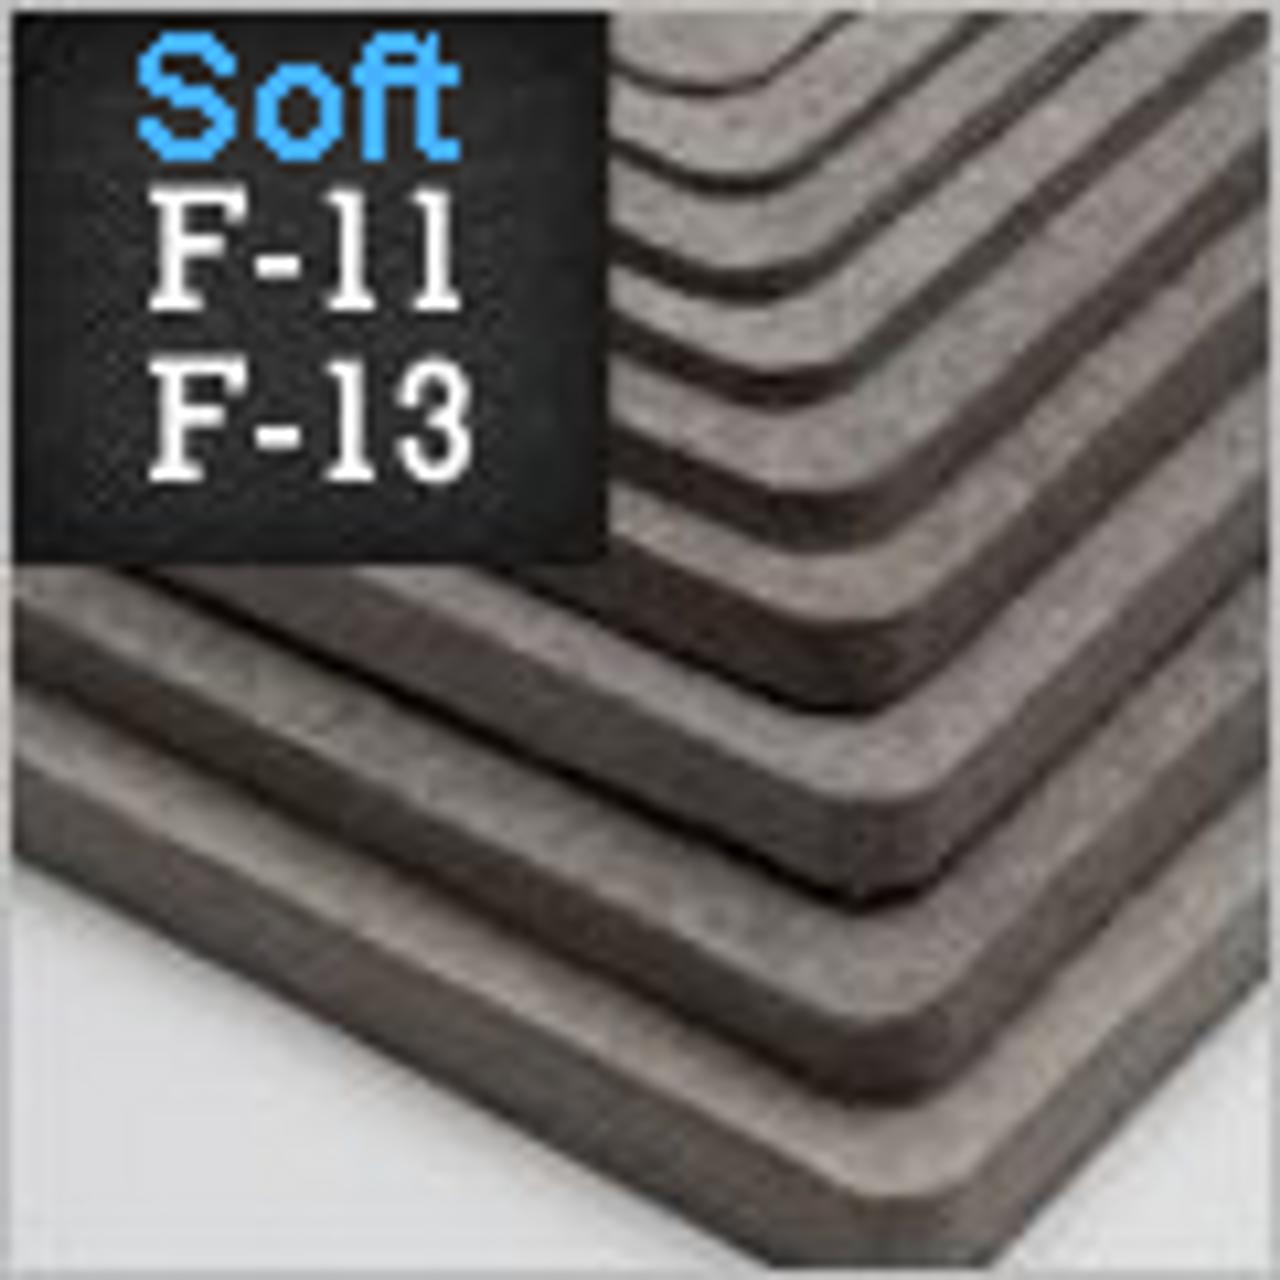 F-11/13 SAE Wool Felt, Gray